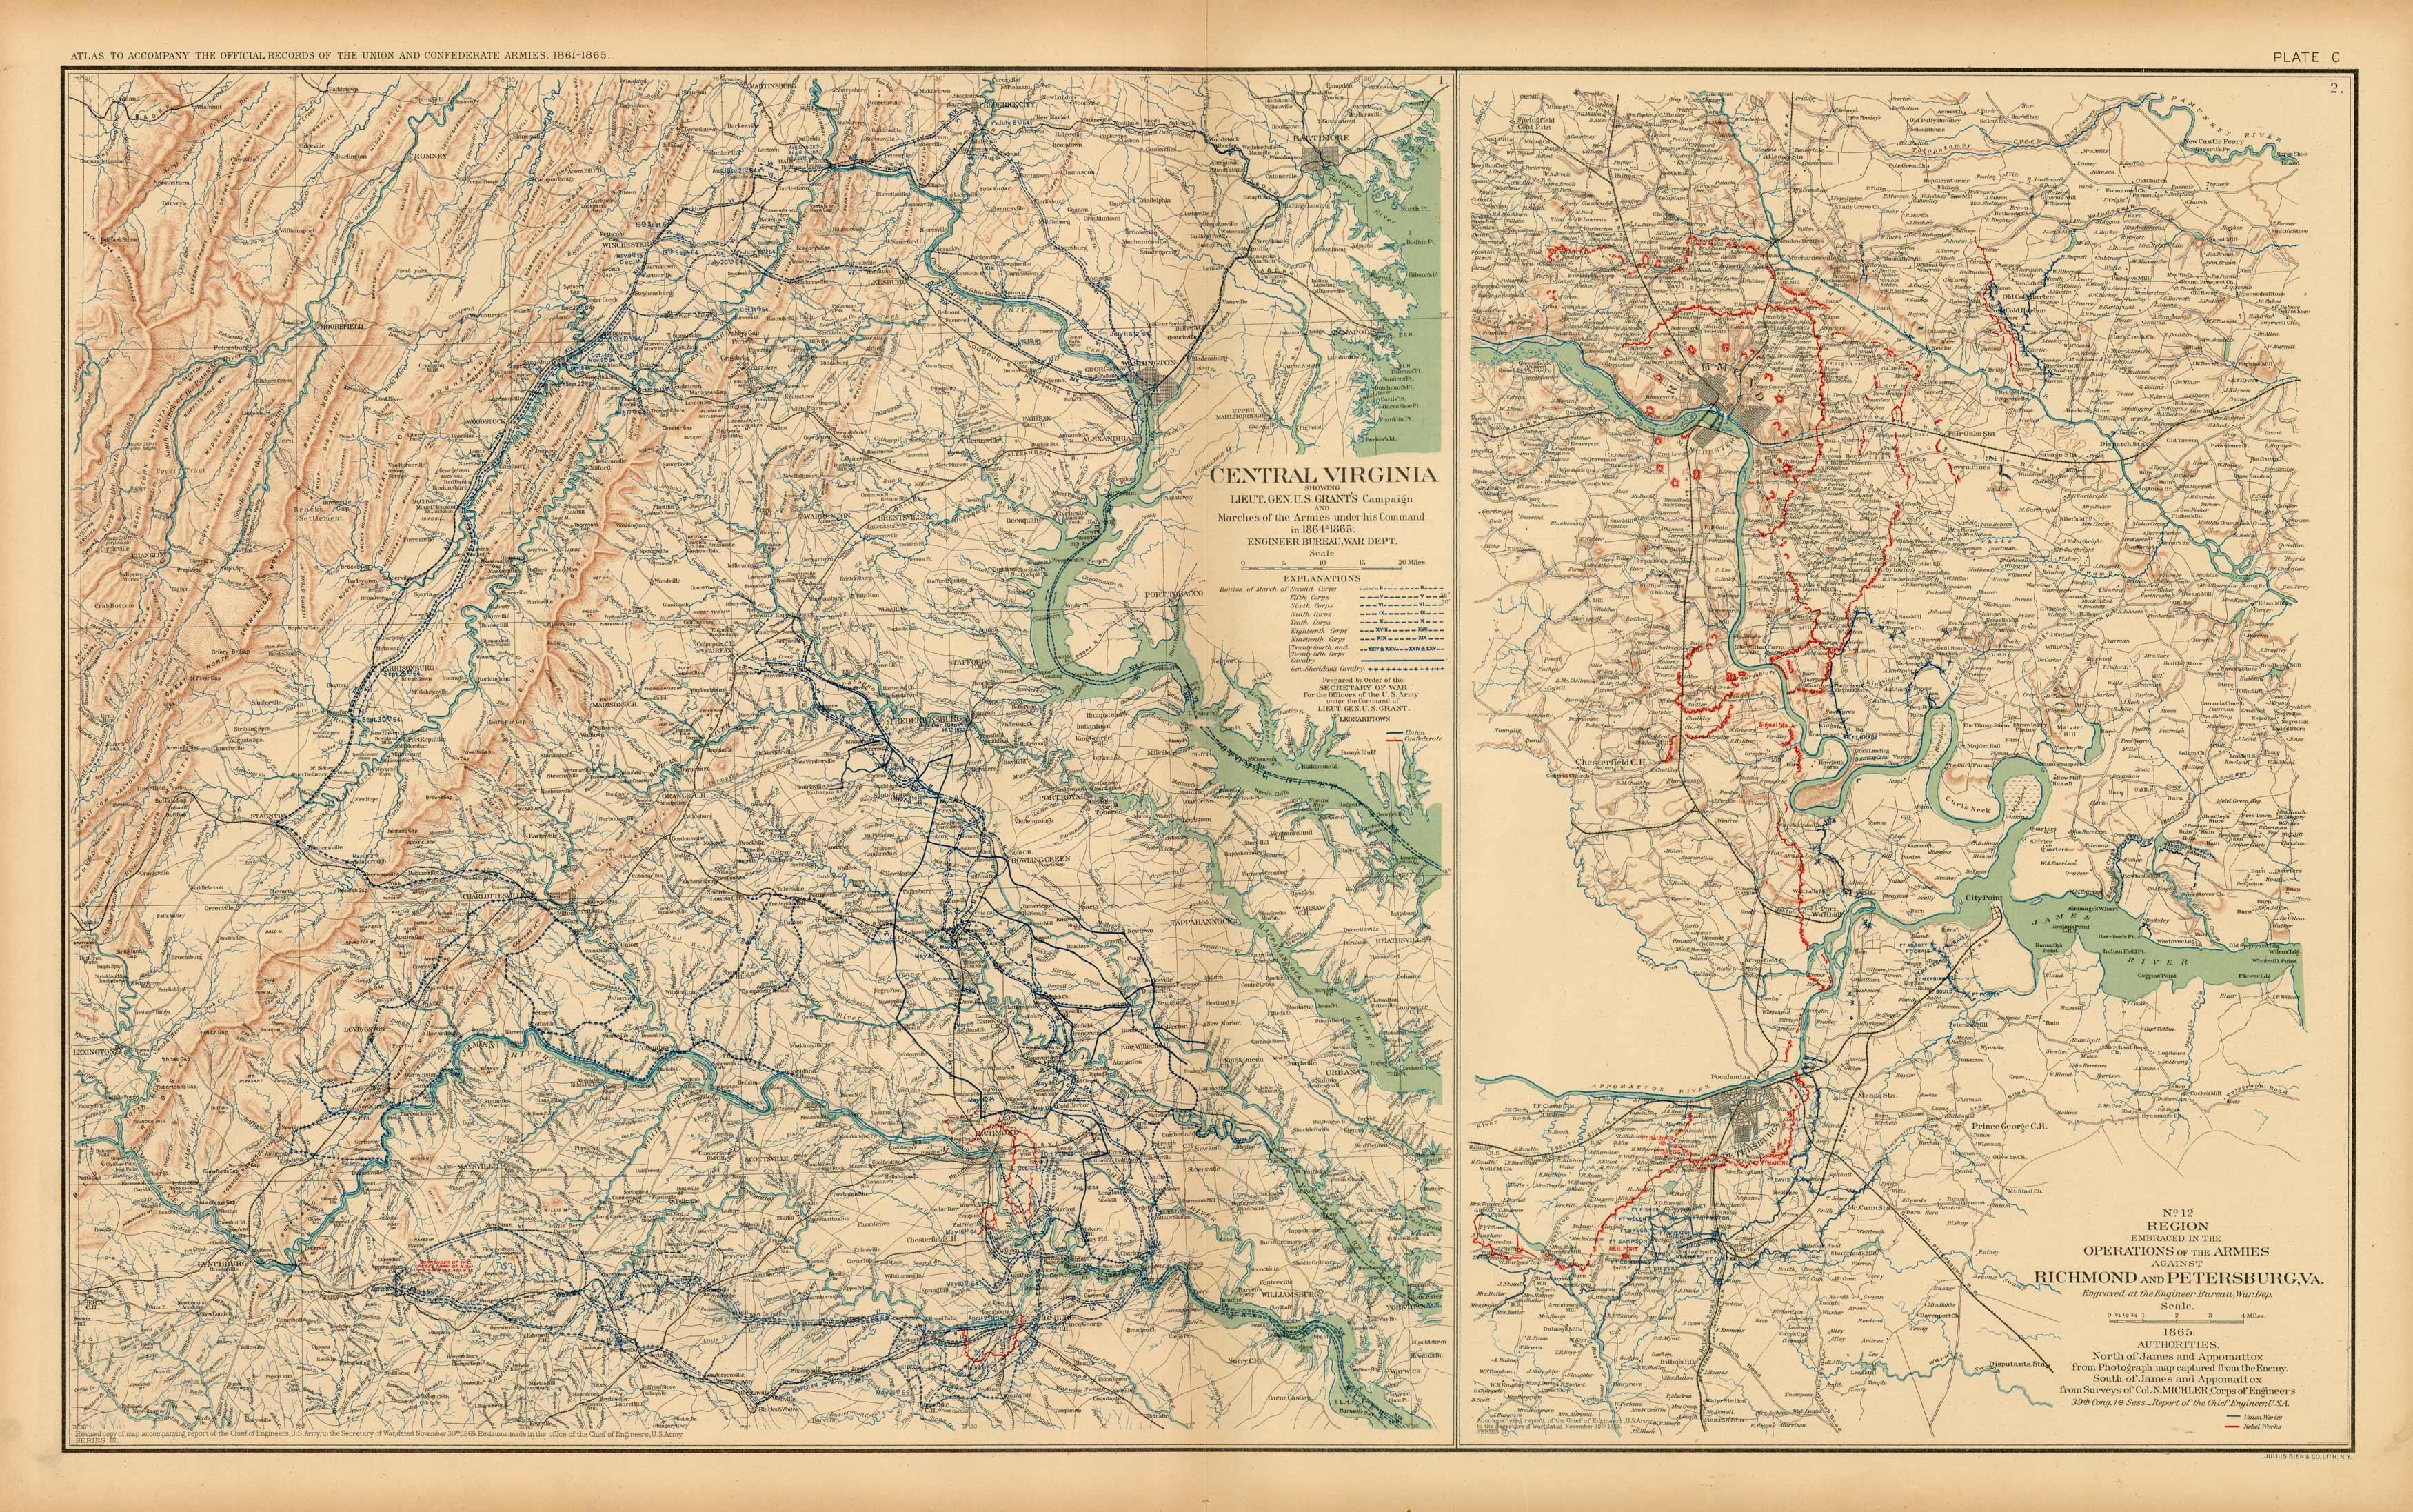 Civil War Atlas; Plate 100; Maps of General Grants Campaign